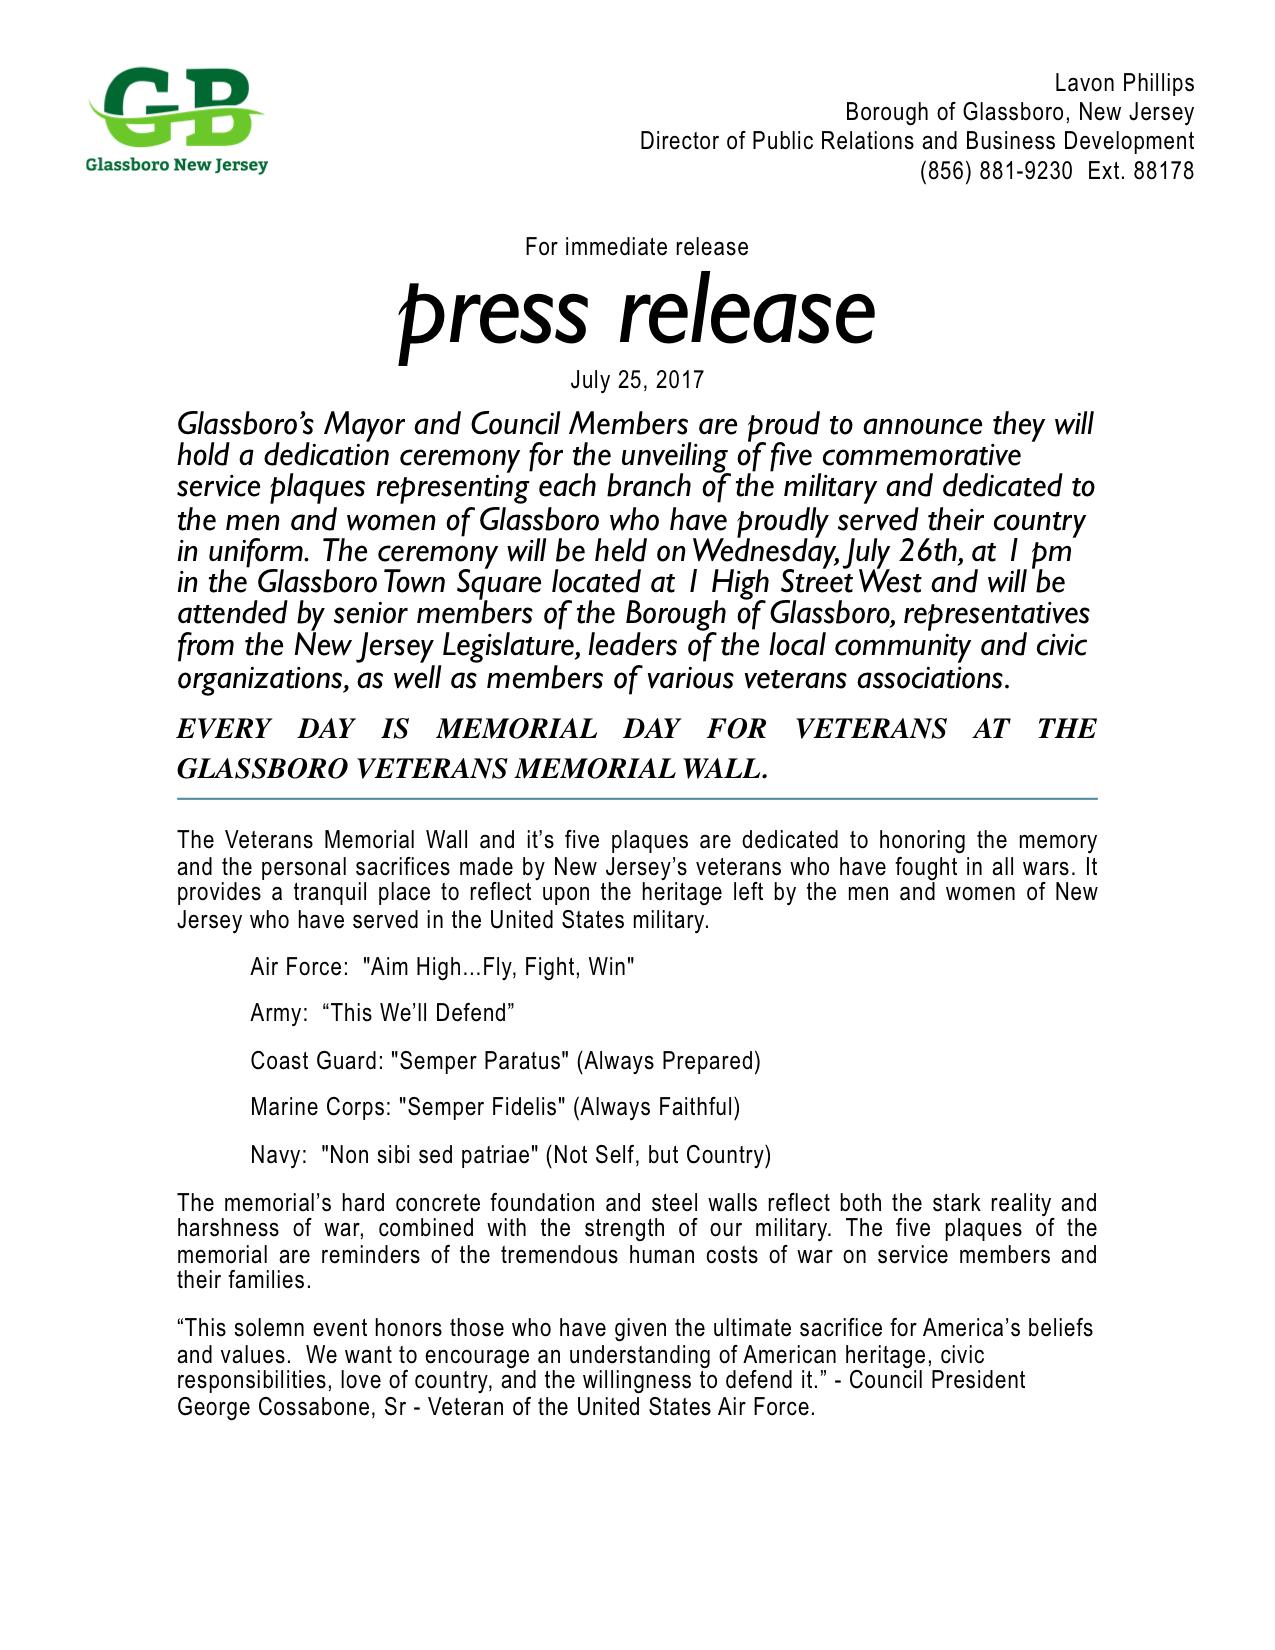 Glassboro NJ Press Release - Dedication of five branches of military crests .jpeg